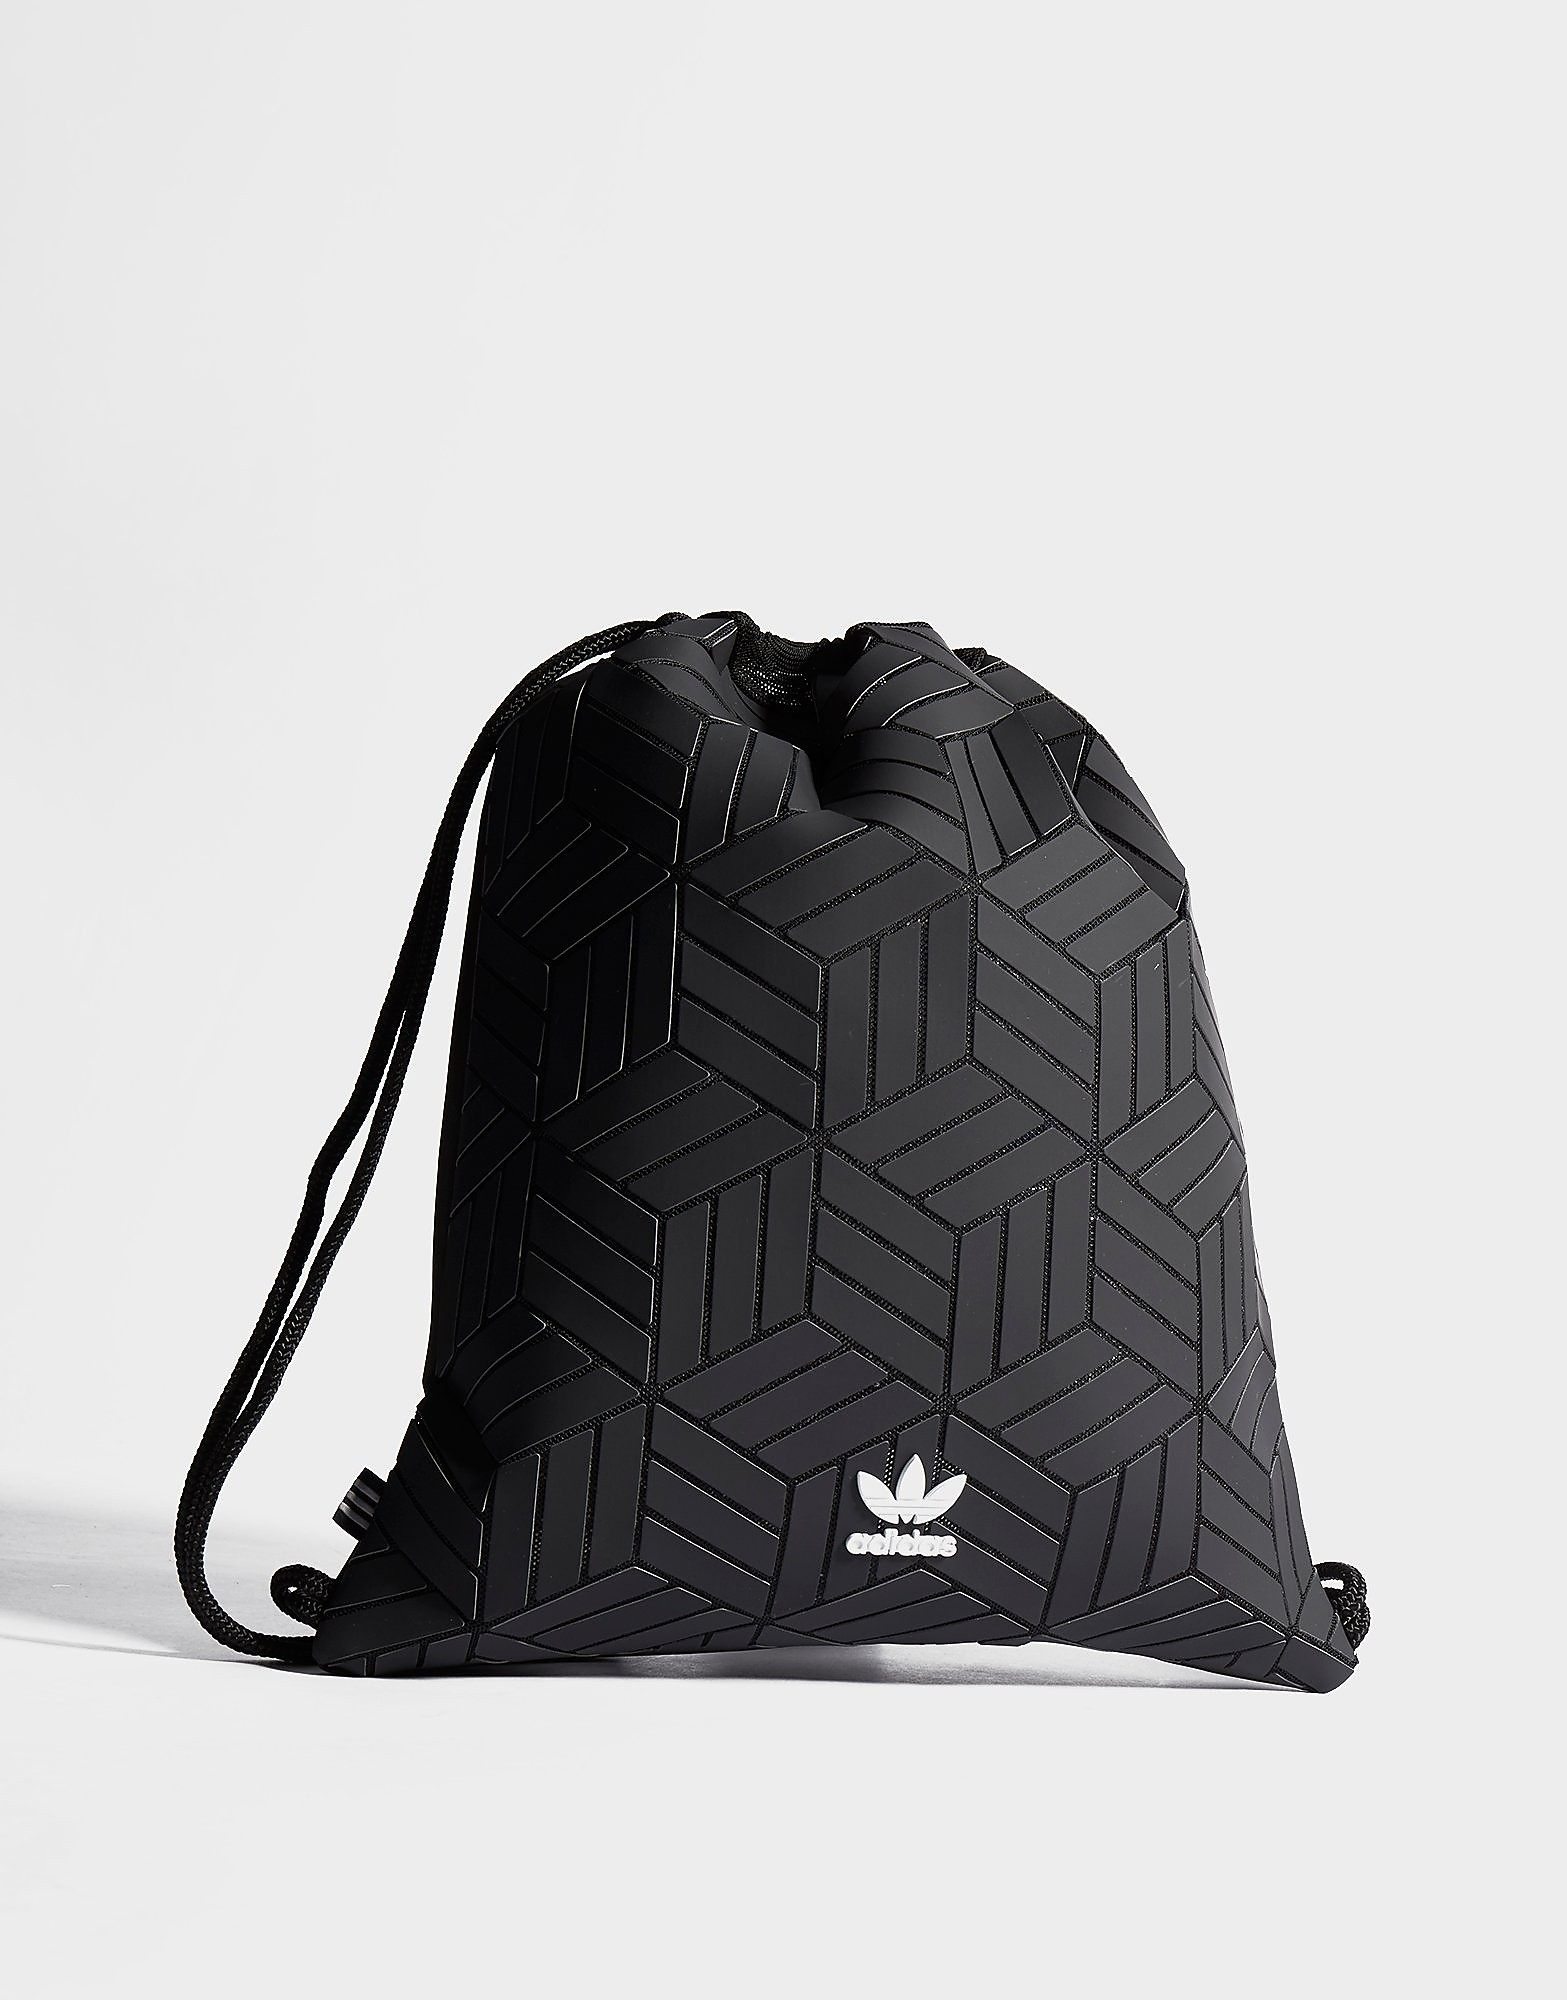 Adidas sporttas zwart en wit